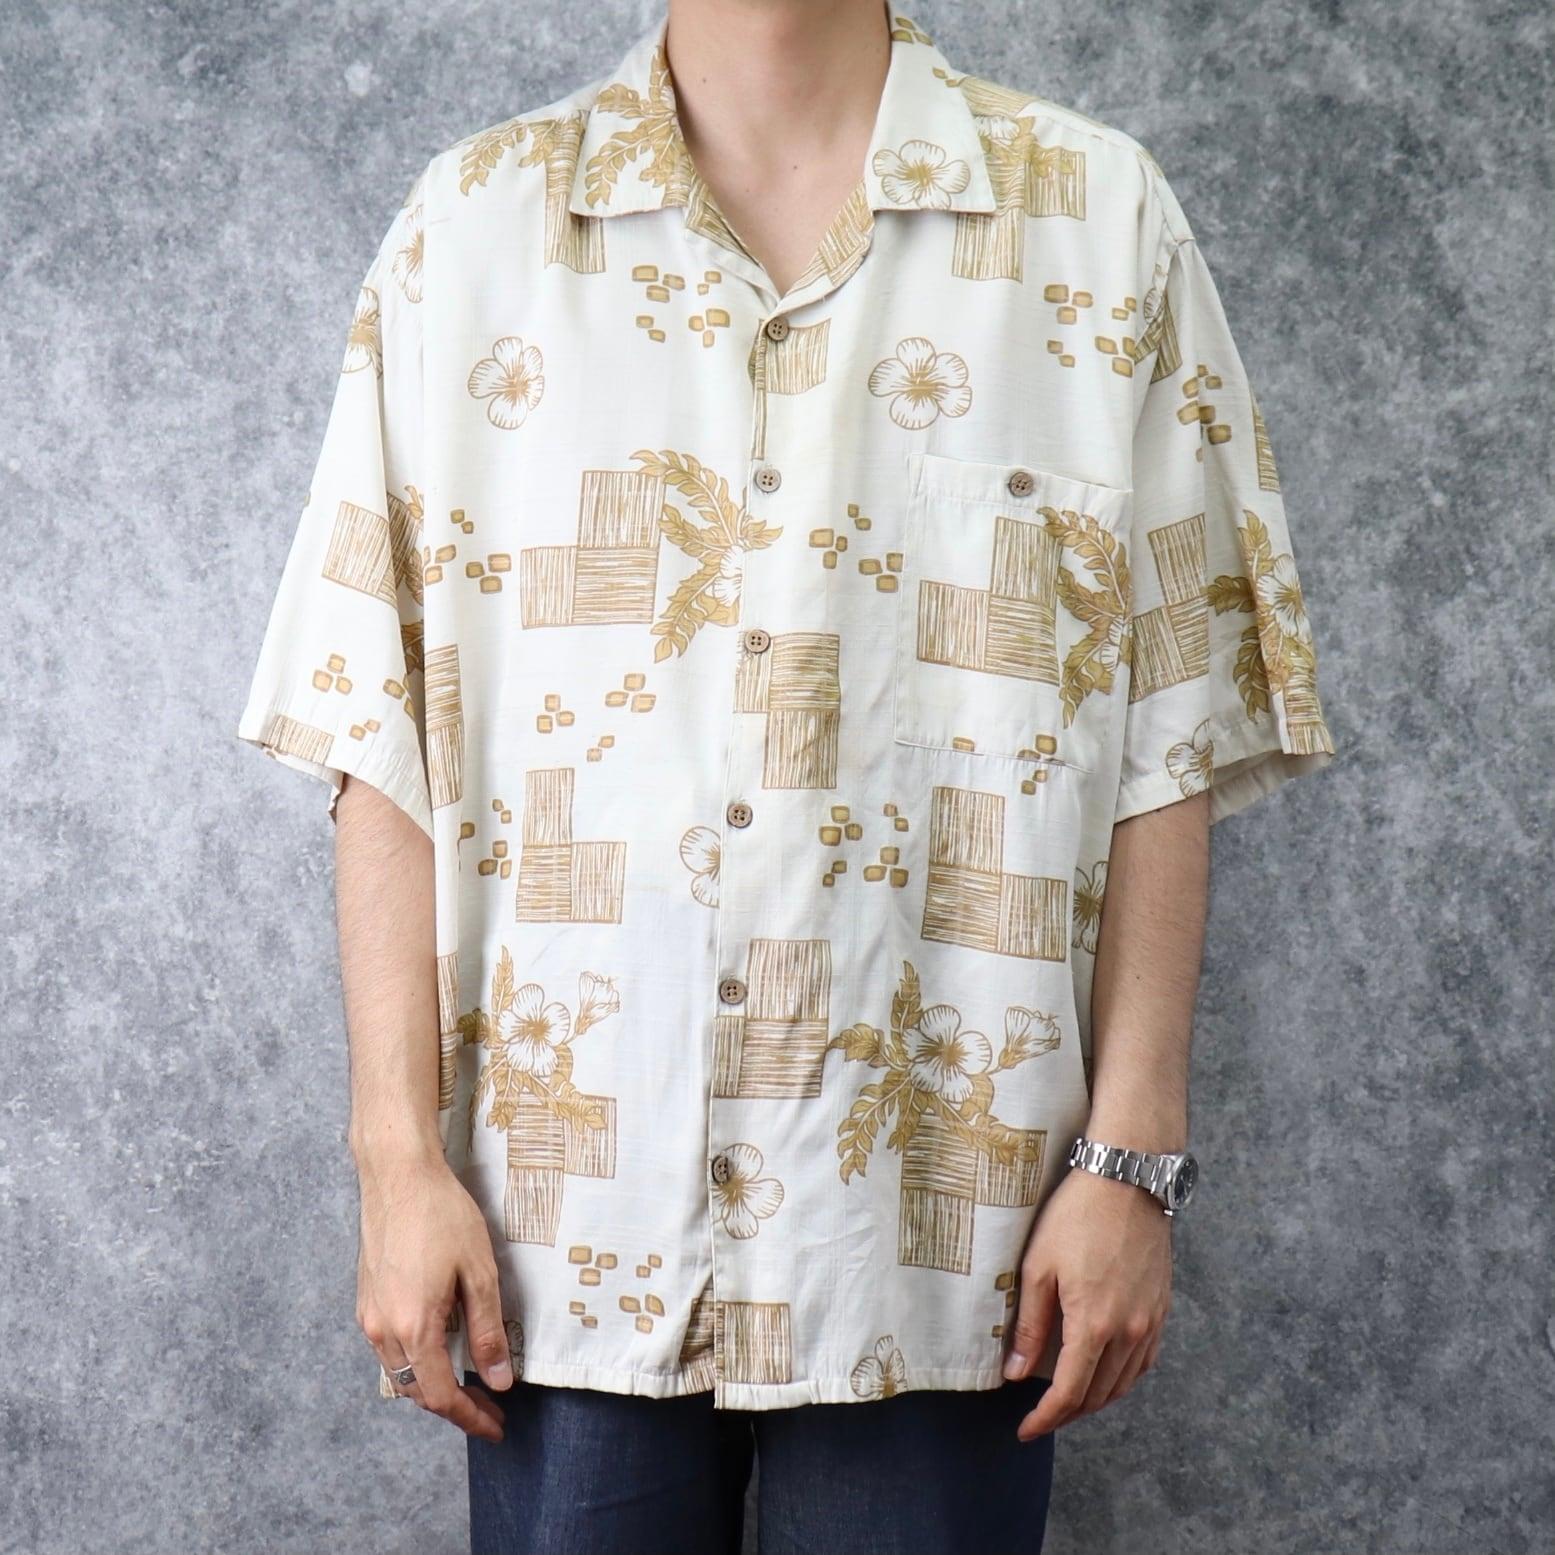 1990s   INDIA   Design   Rayon   Shirts   XXXL A252